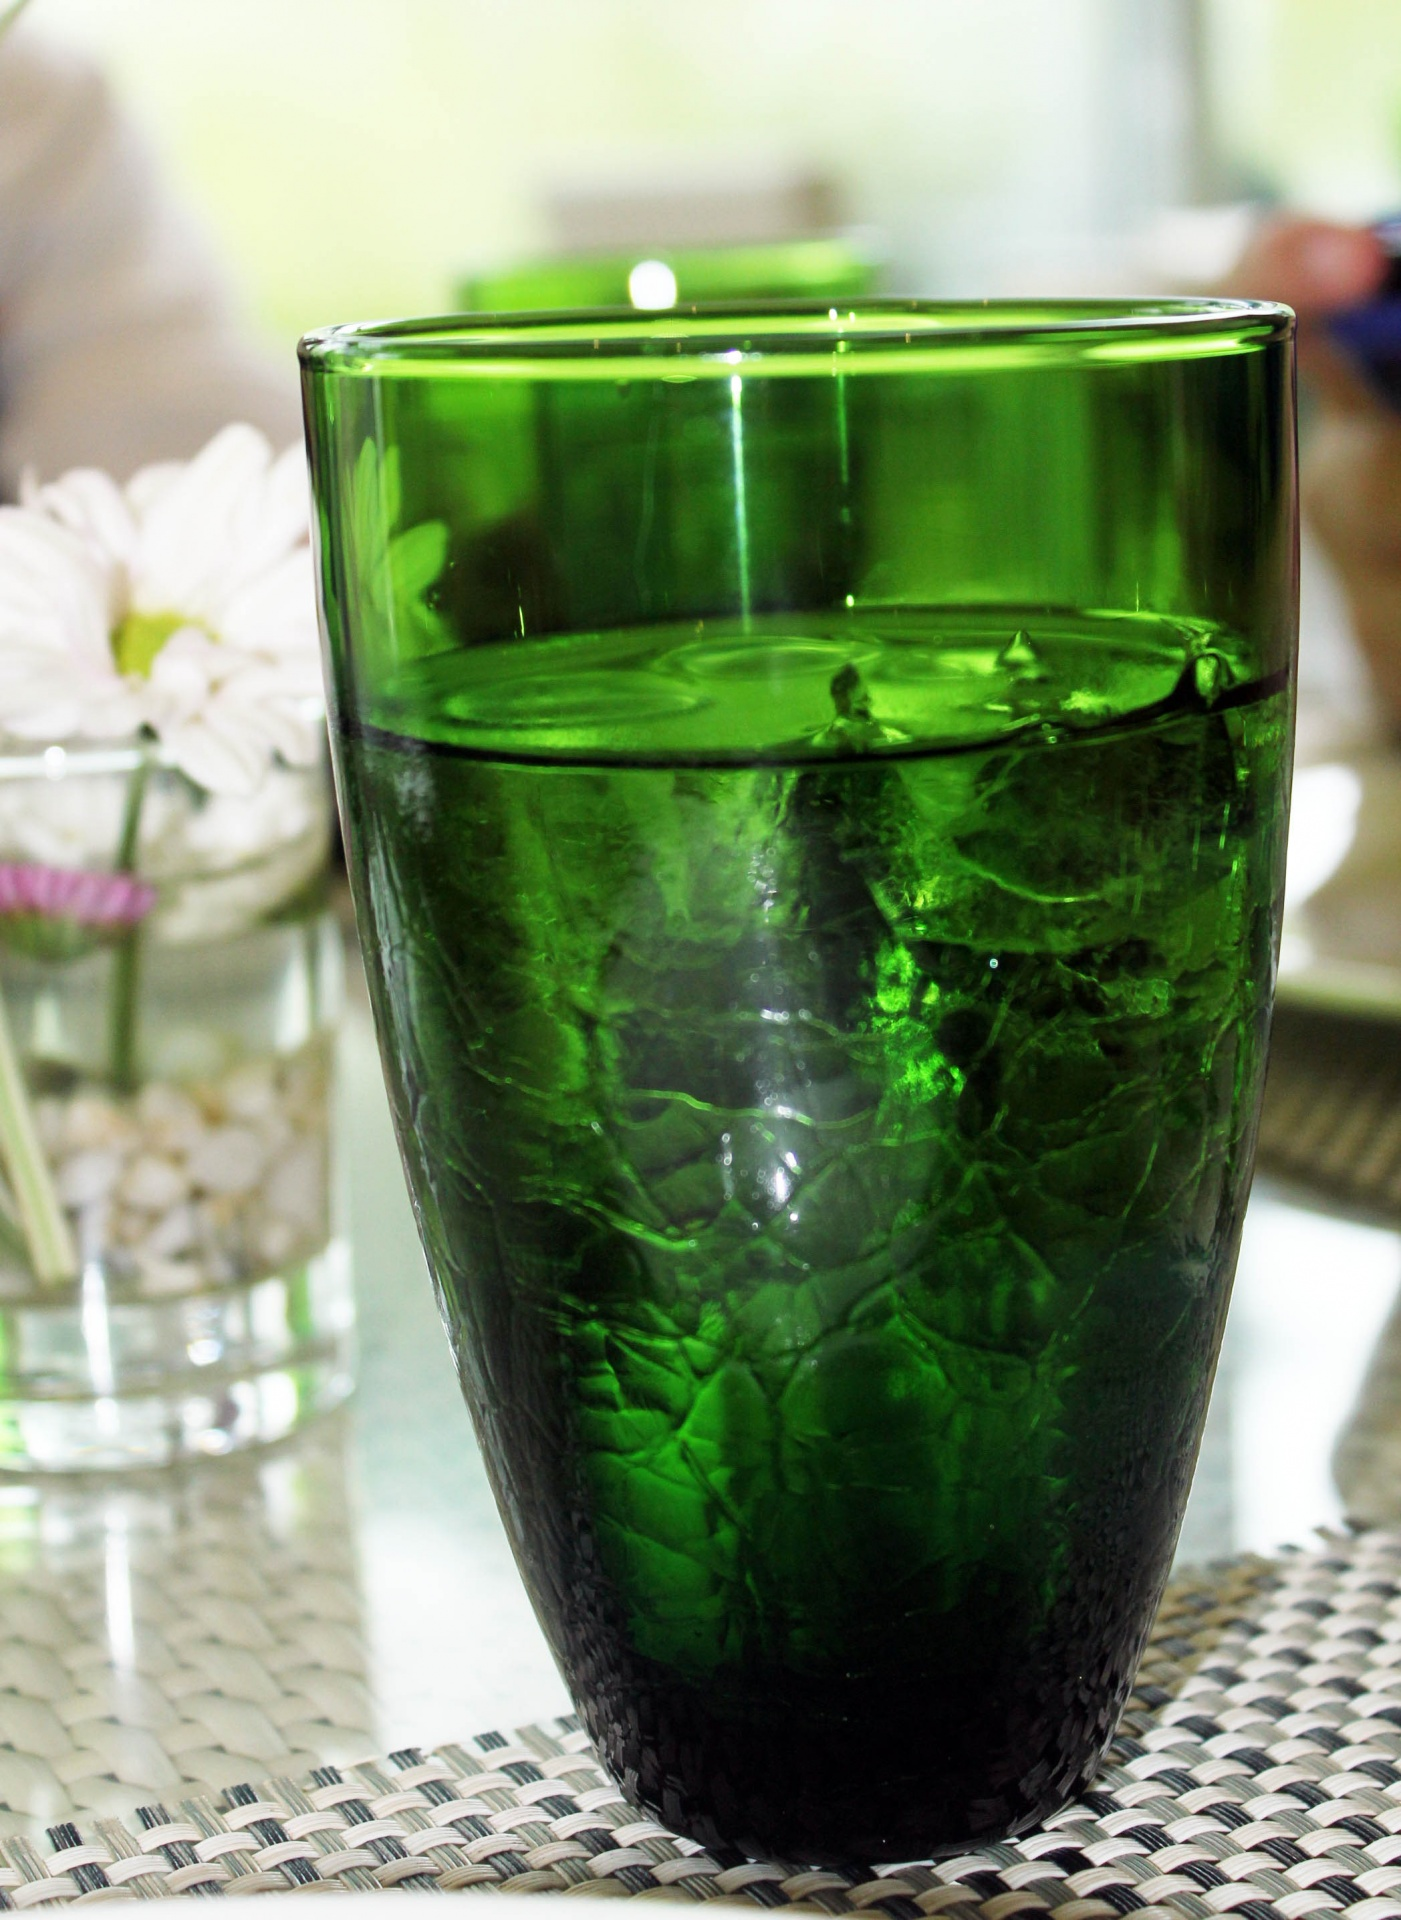 綠色玻璃 免費圖片 - Public Domain Pictures